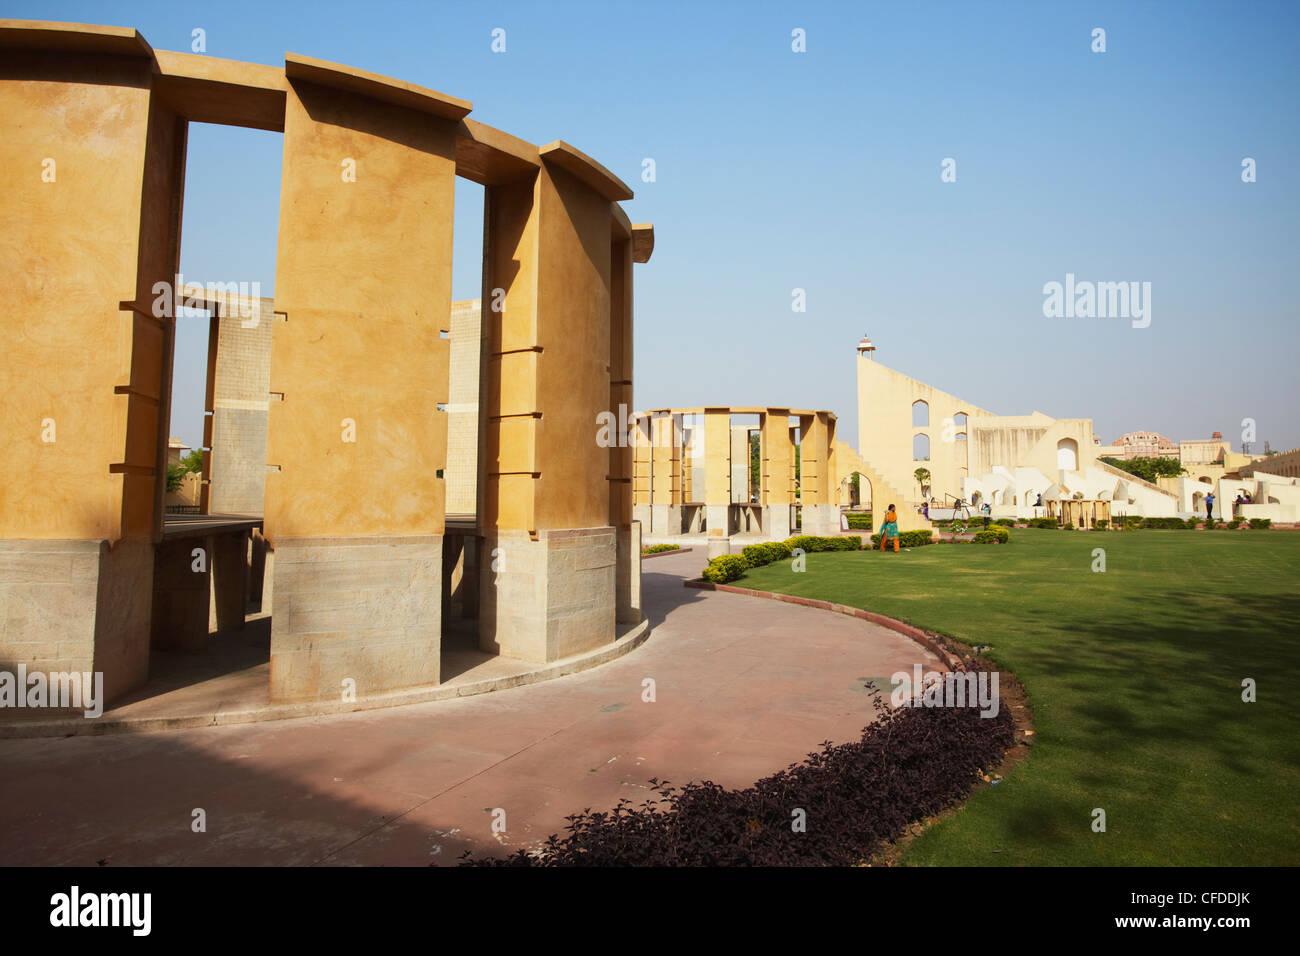 Strumenti astronomici a Jantar Mantar, Sito Patrimonio Mondiale dell'UNESCO, Jaipur, Rajasthan, India, Asia Immagini Stock